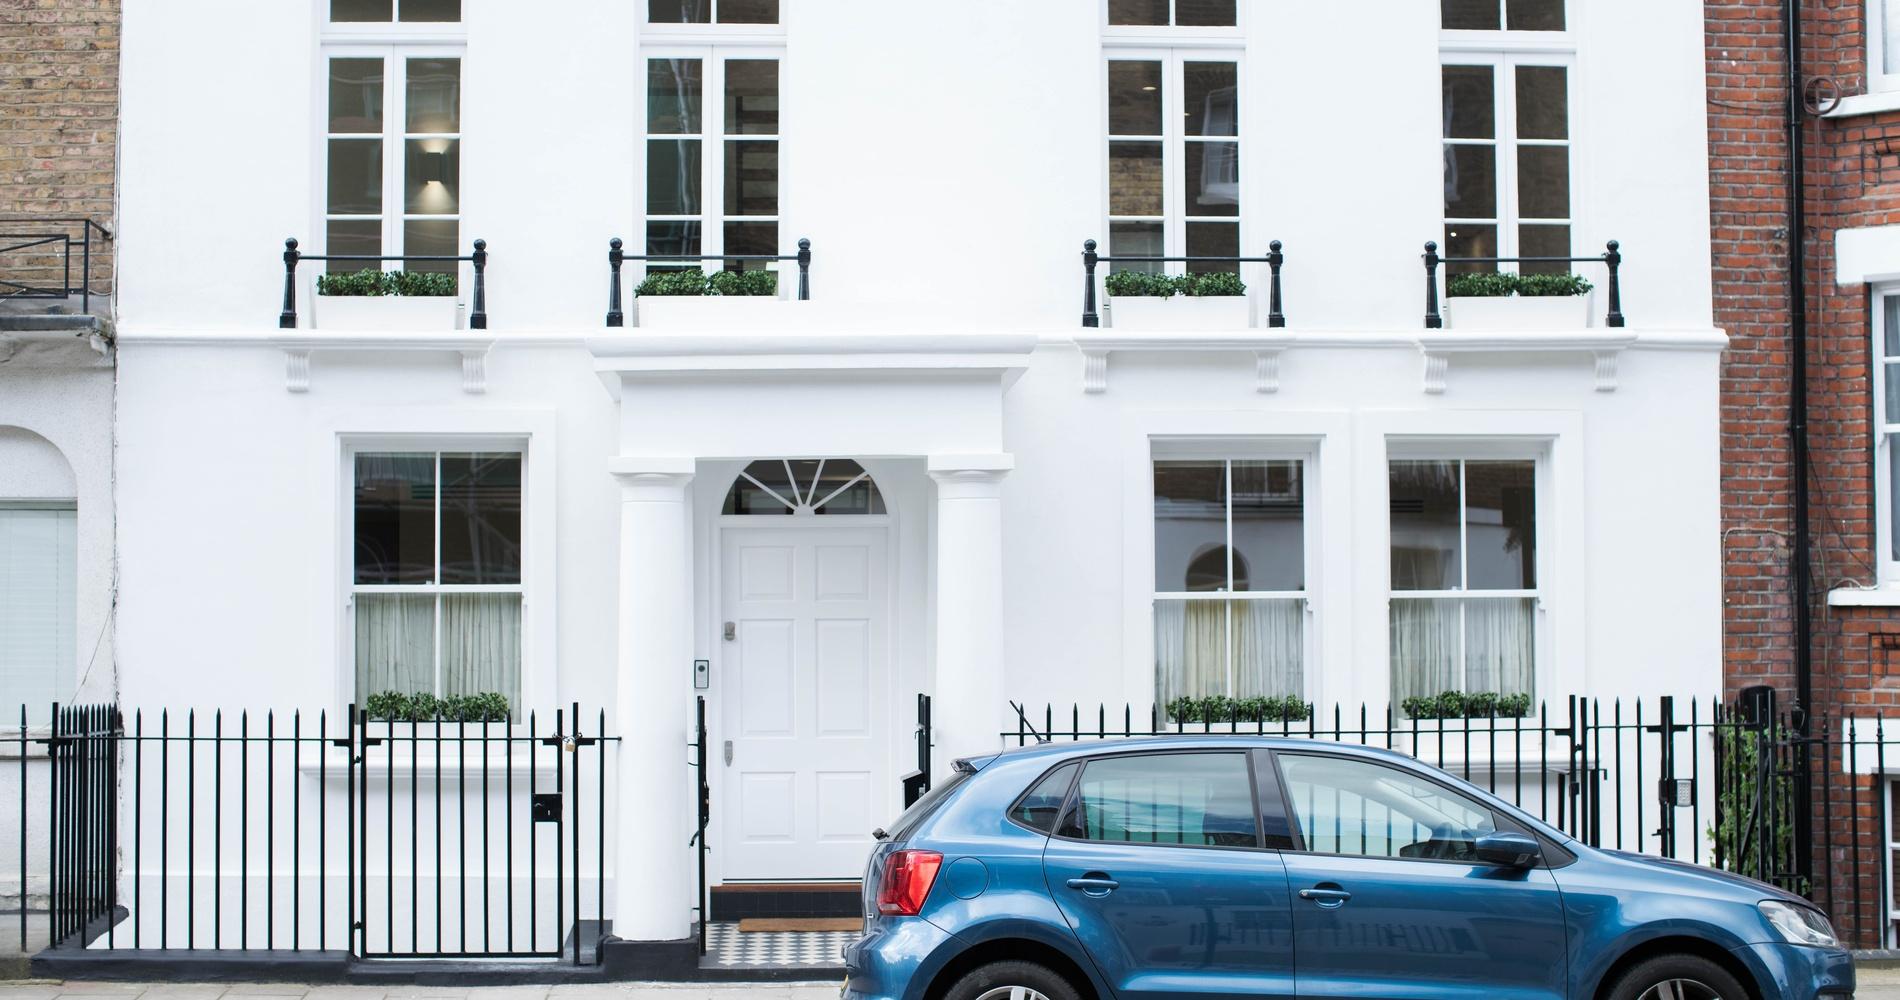 Marylebone Sash Windows and Wood Front Door - West London